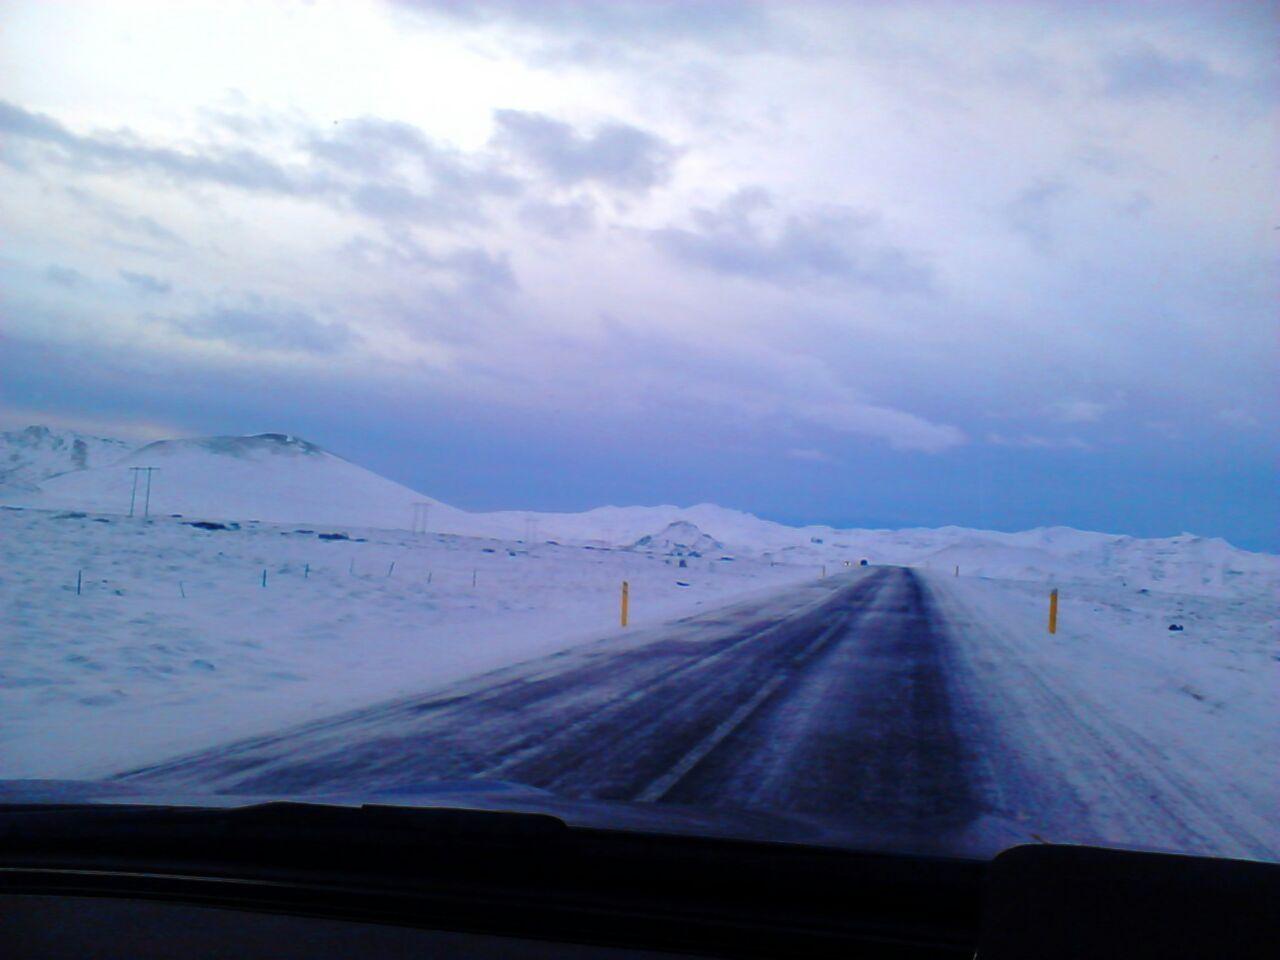 Islanda_Servidoras.02